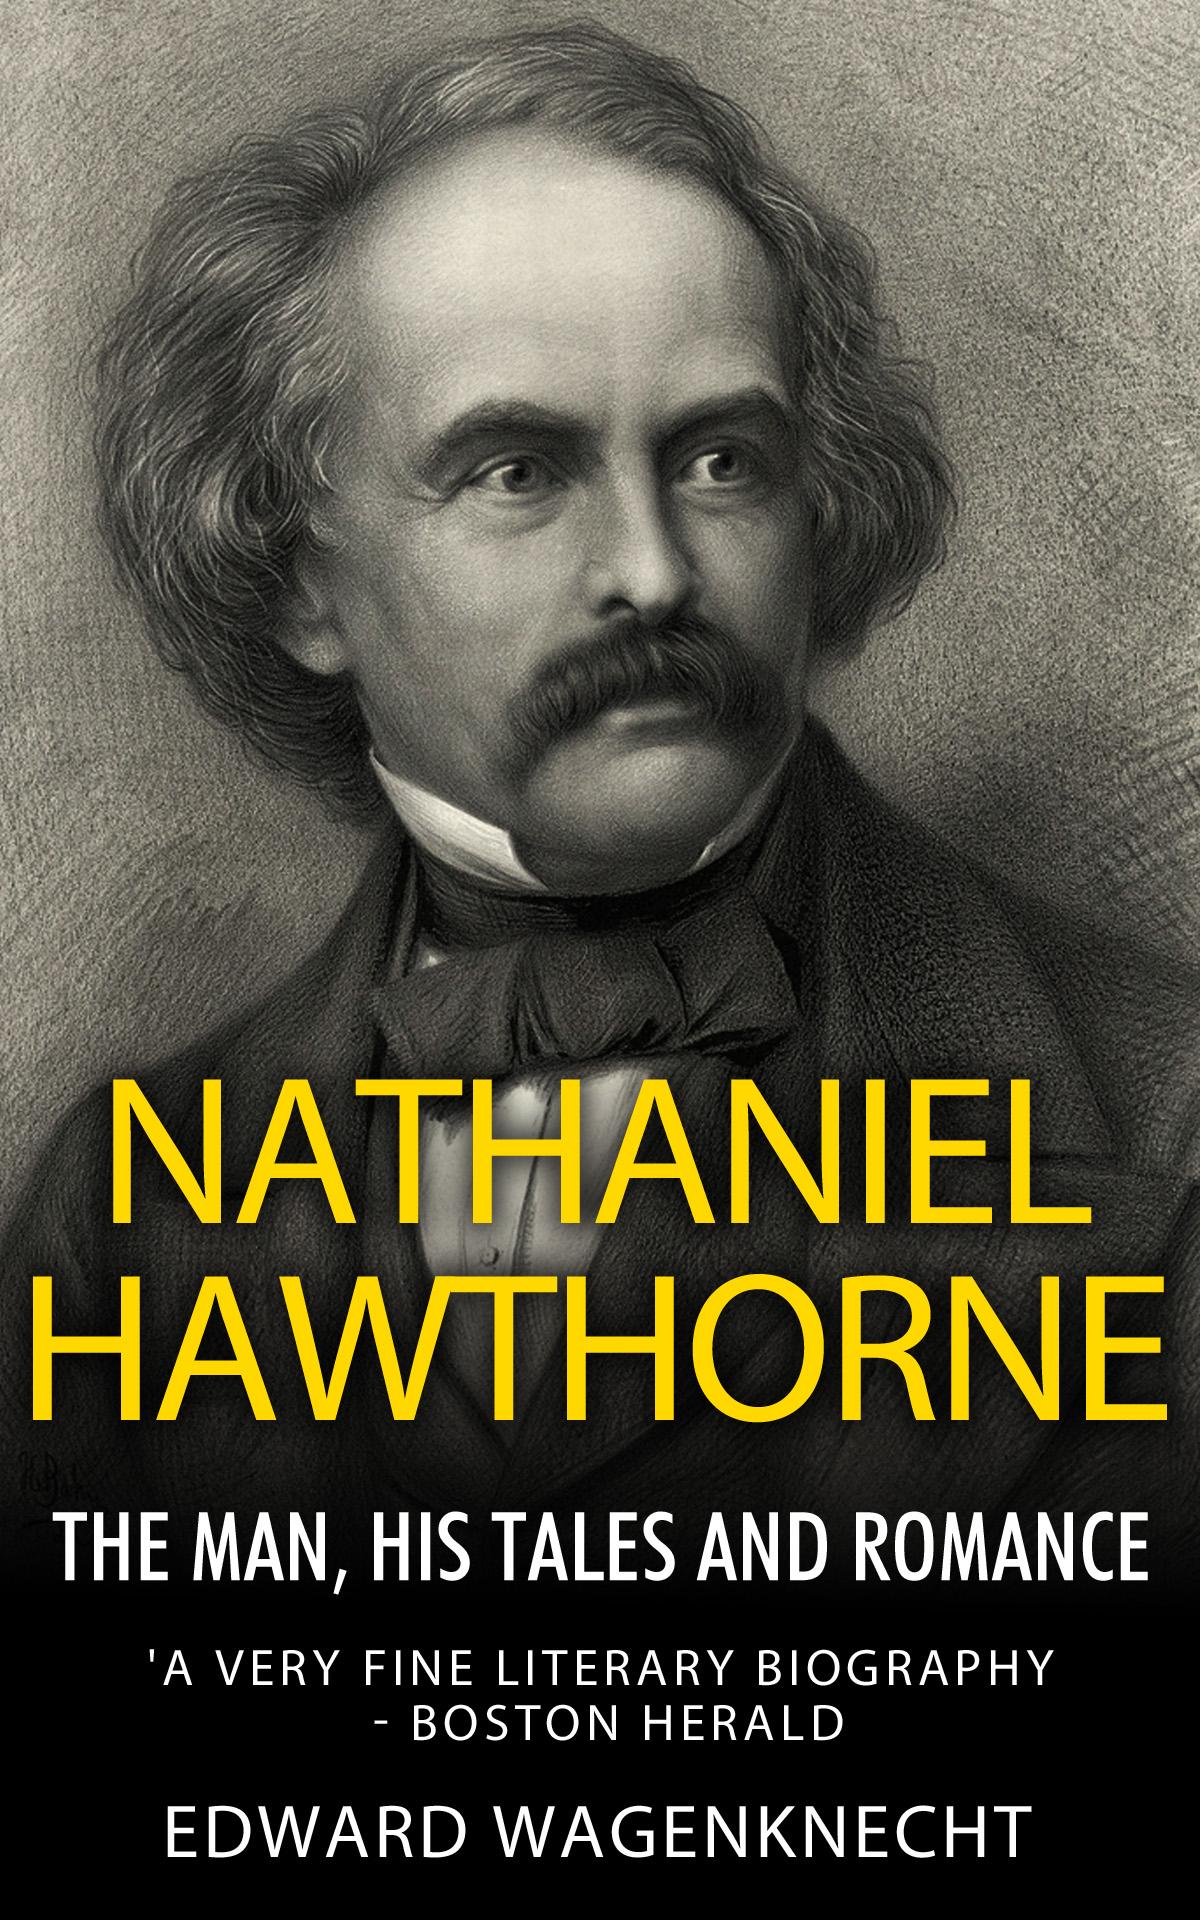 Literary Criticism on Nathaniel Hawthorne?